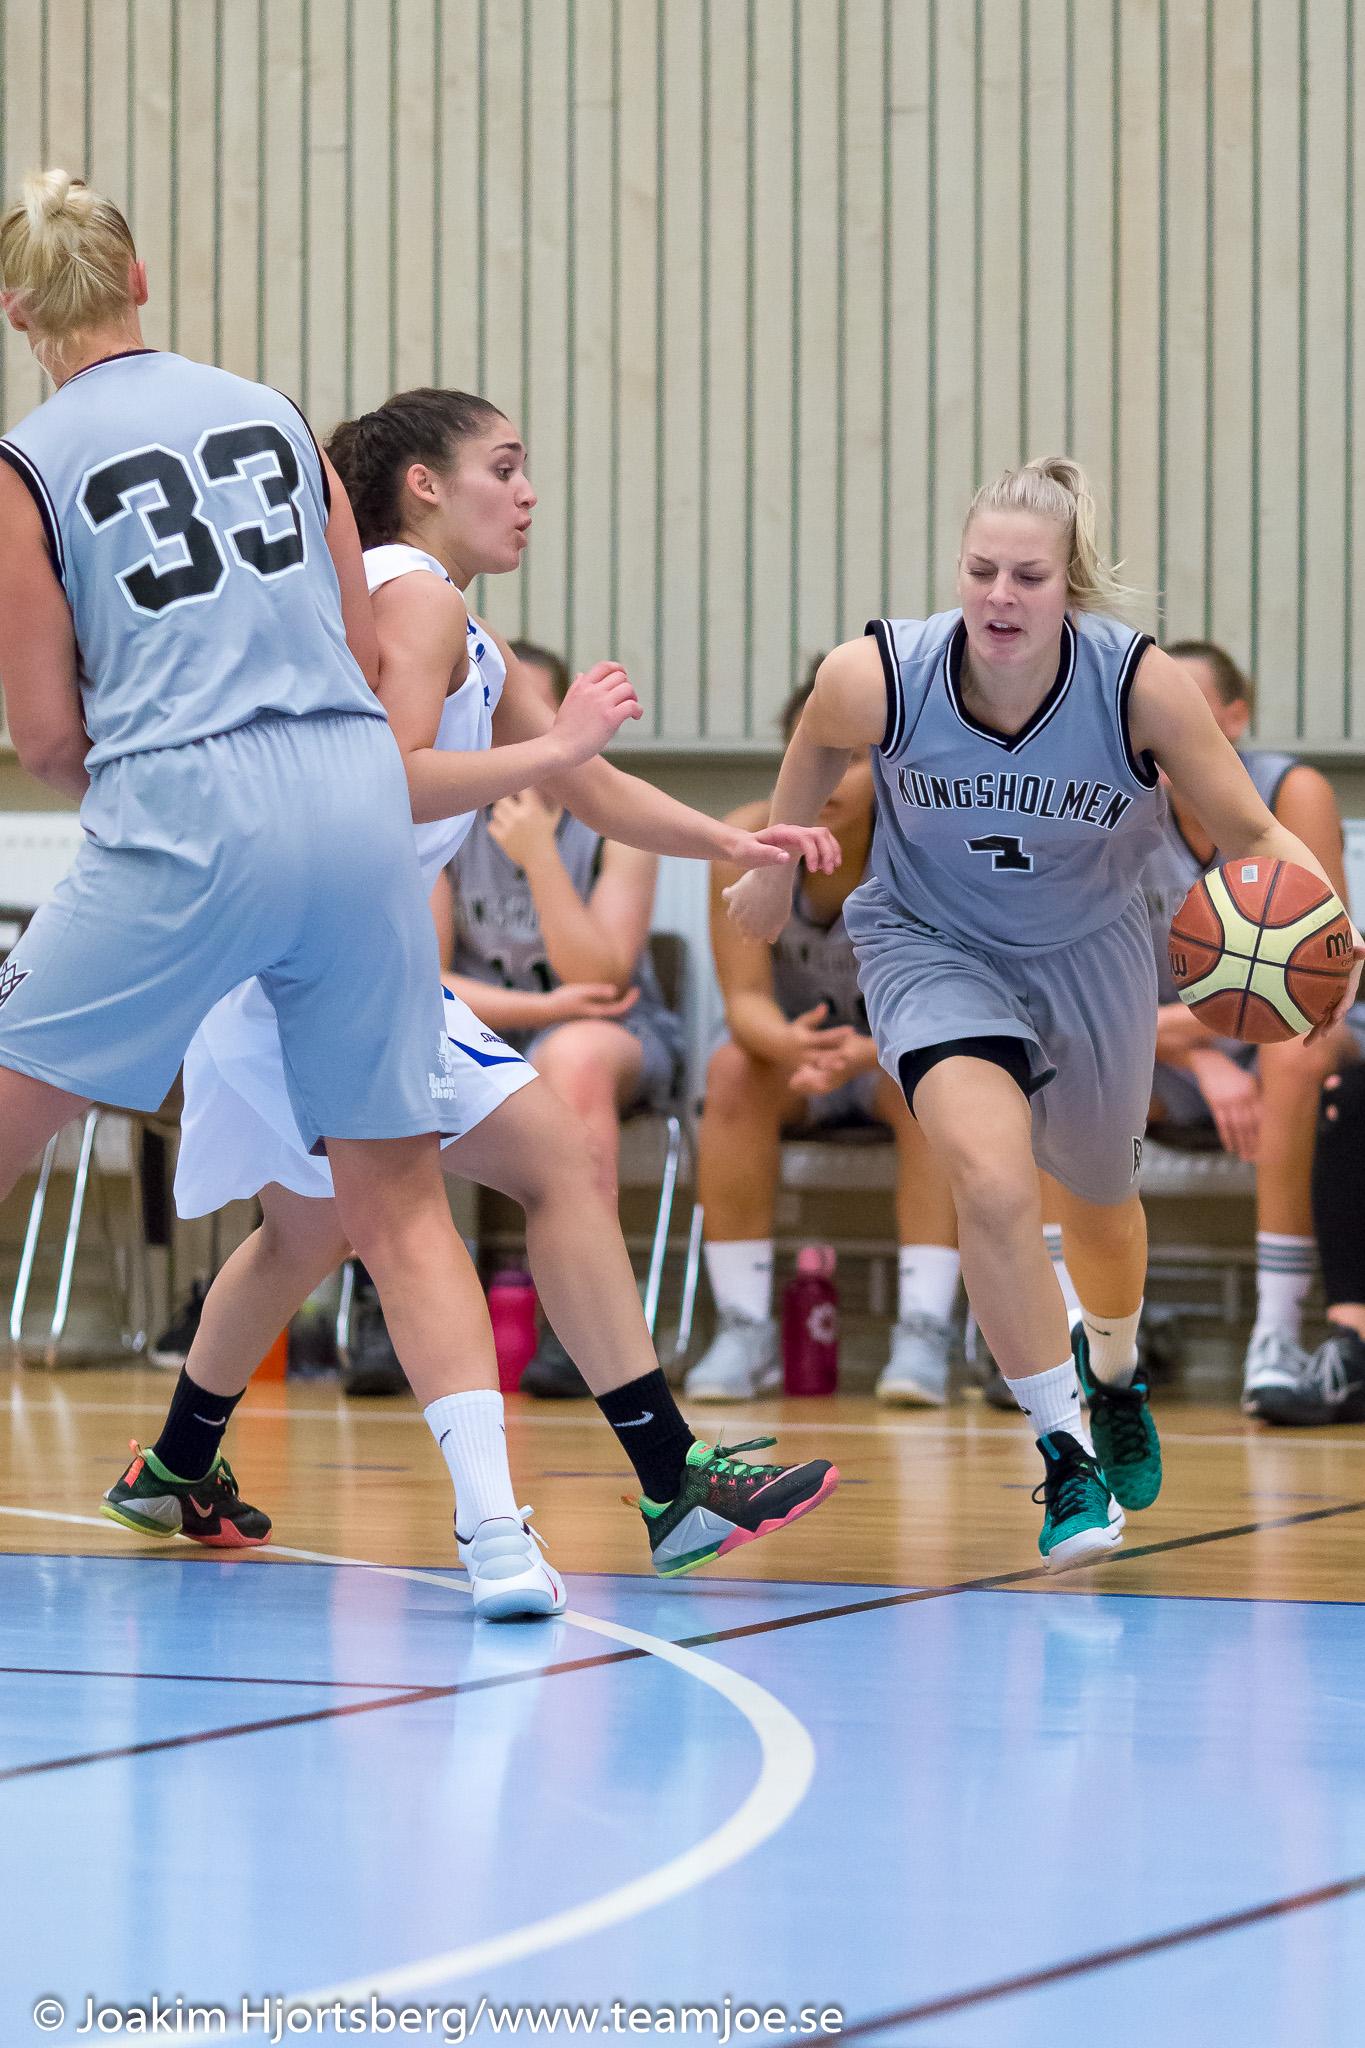 2016-10-09 KFUM Örebro Basket-Kungsholmen Basket